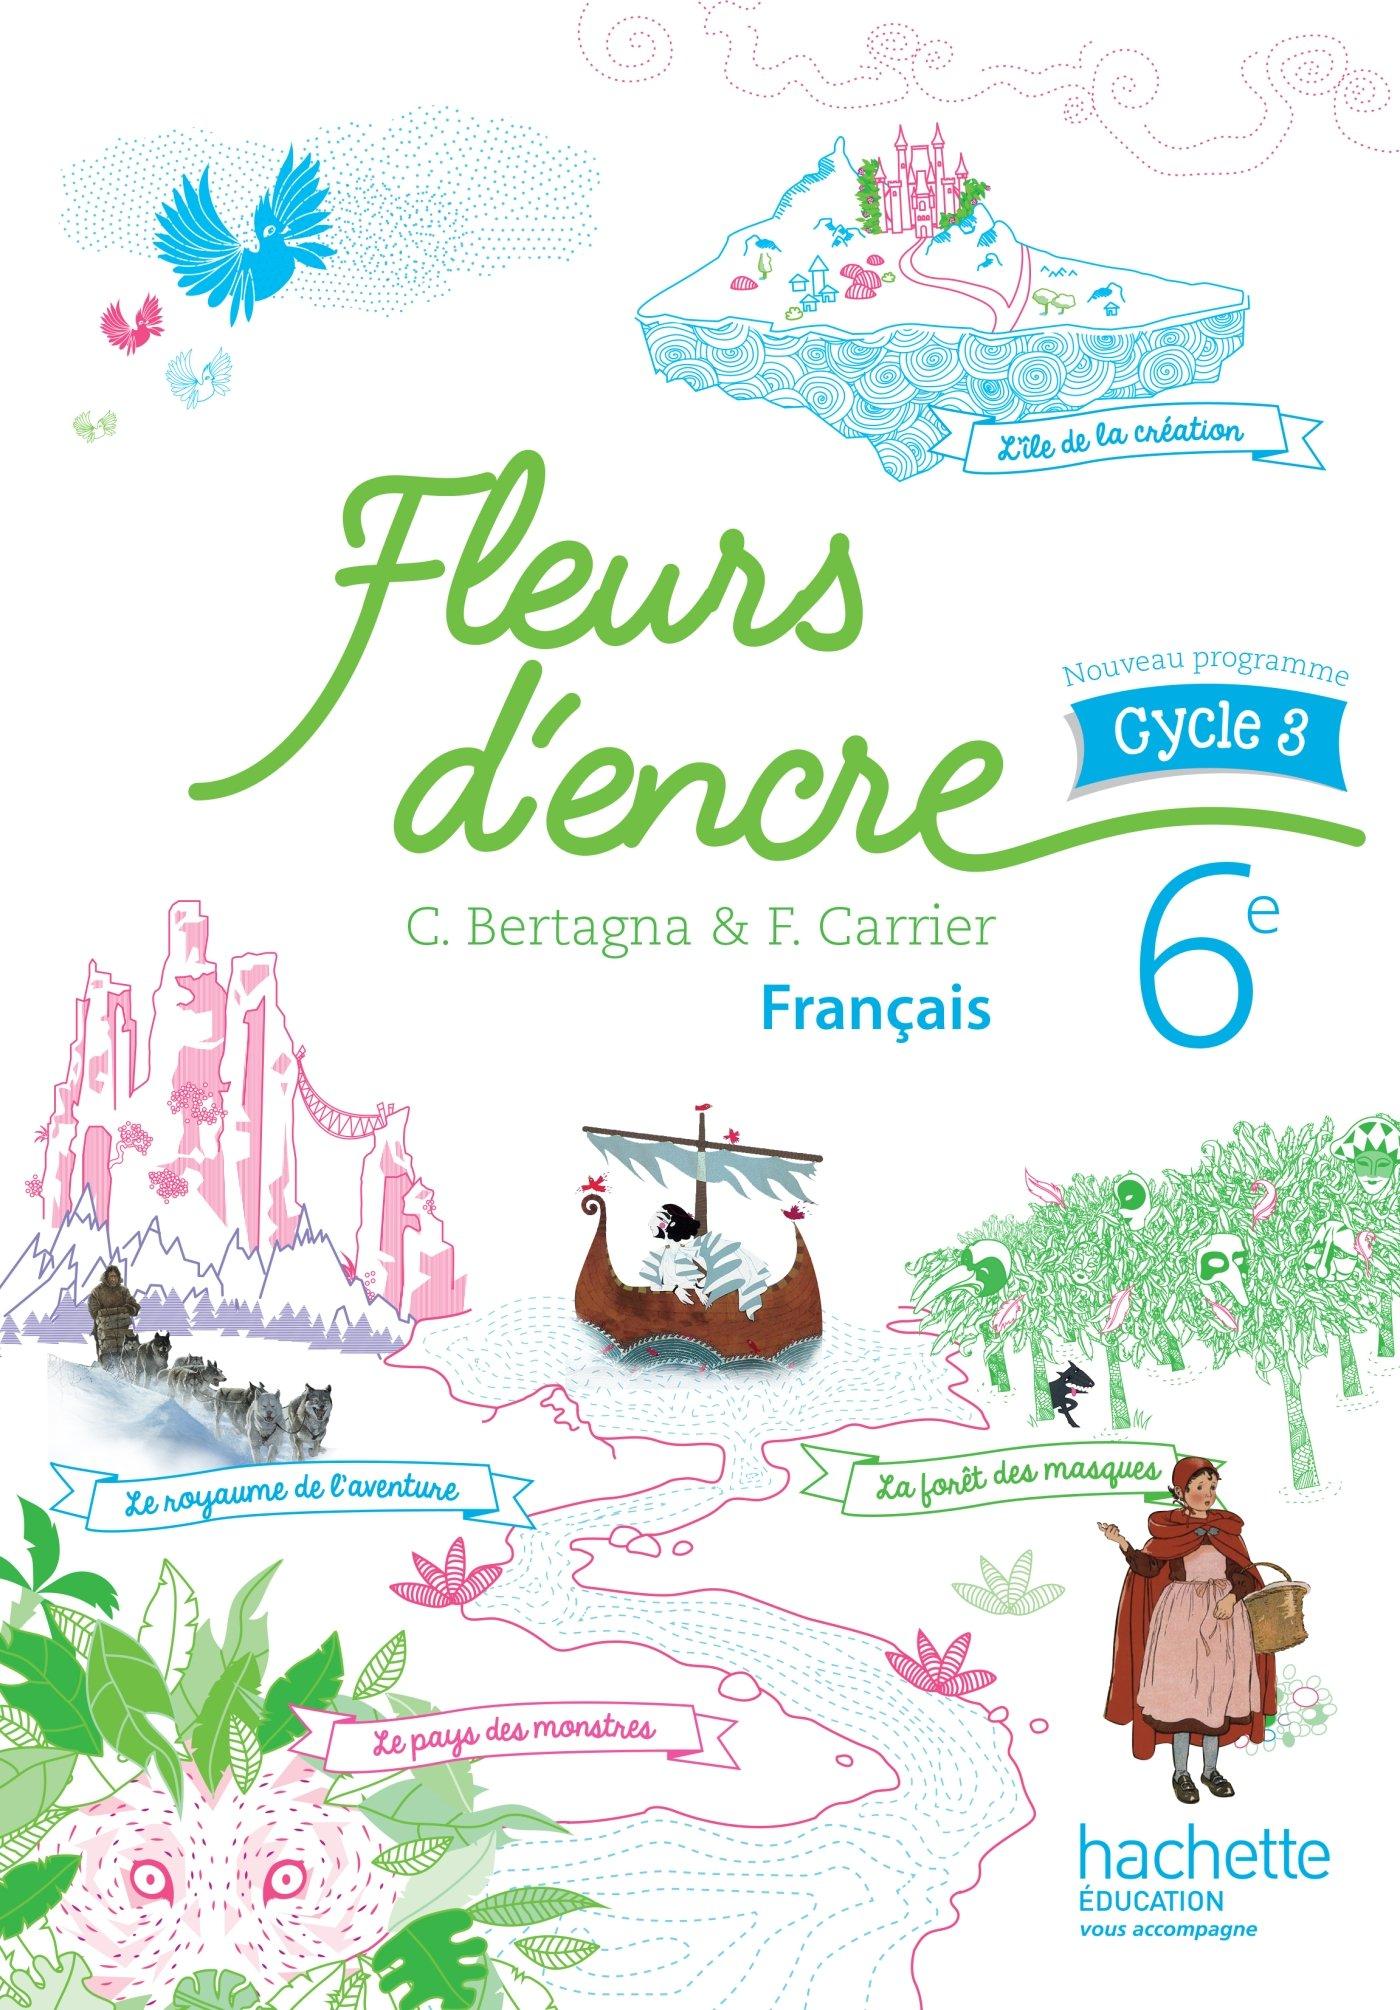 Fleurs dencre français cycle 3 / 6e - Livre élève - éd. 2016: Amazon.es: Bertagna, Chantal, Carrier, Françoise: Libros en idiomas extranjeros